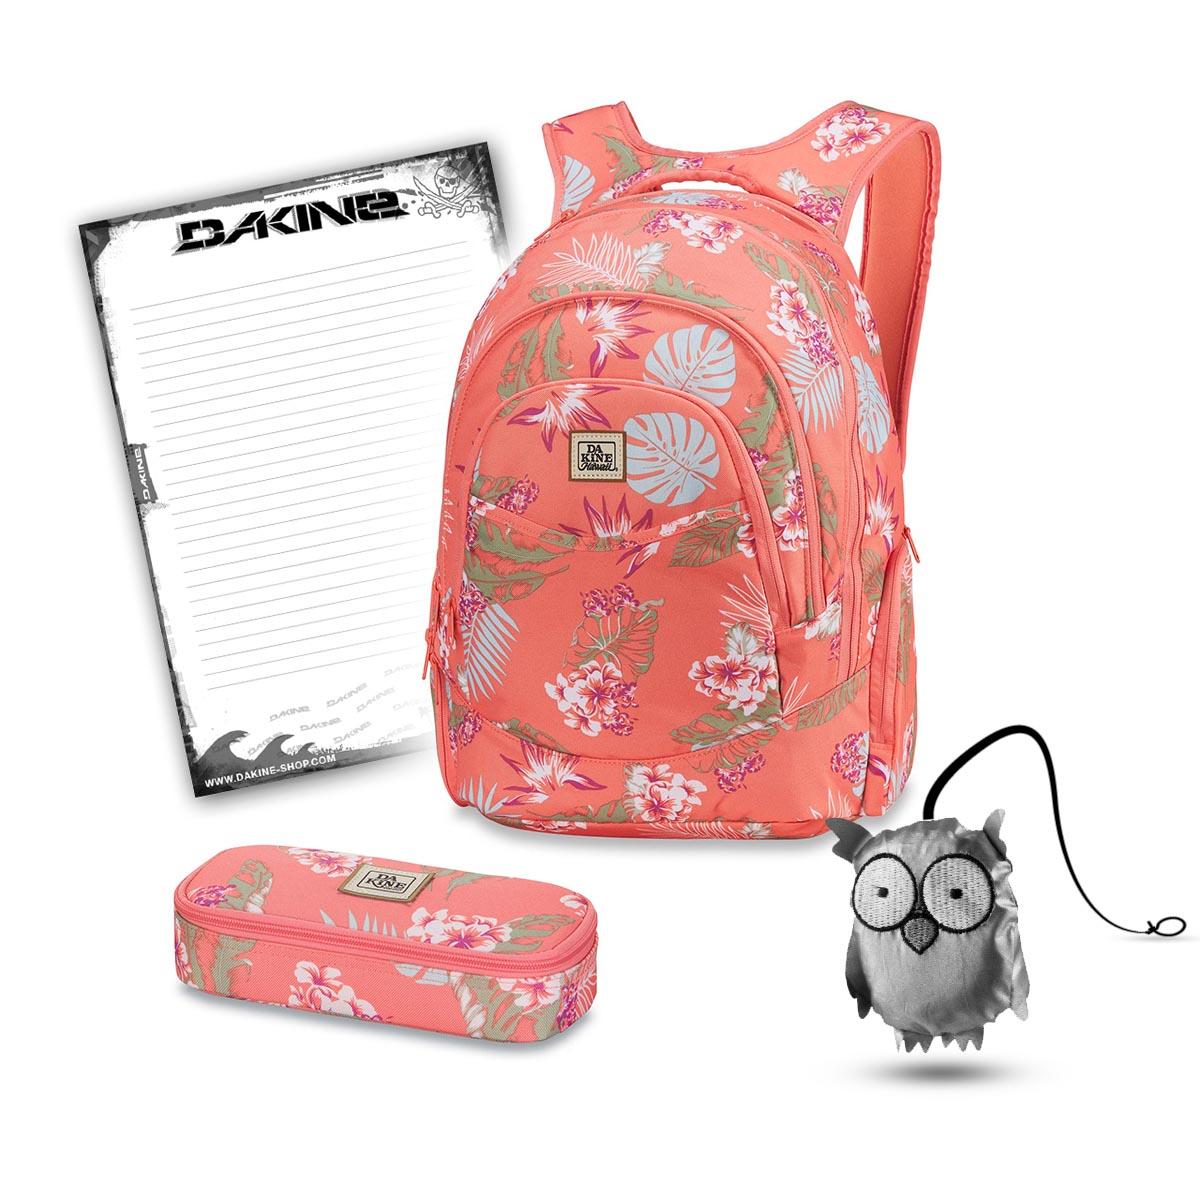 a41649ce147a5 Dakine Prom 25L + School Case + Emma + Bloc Set d Ecole Waikiki ...